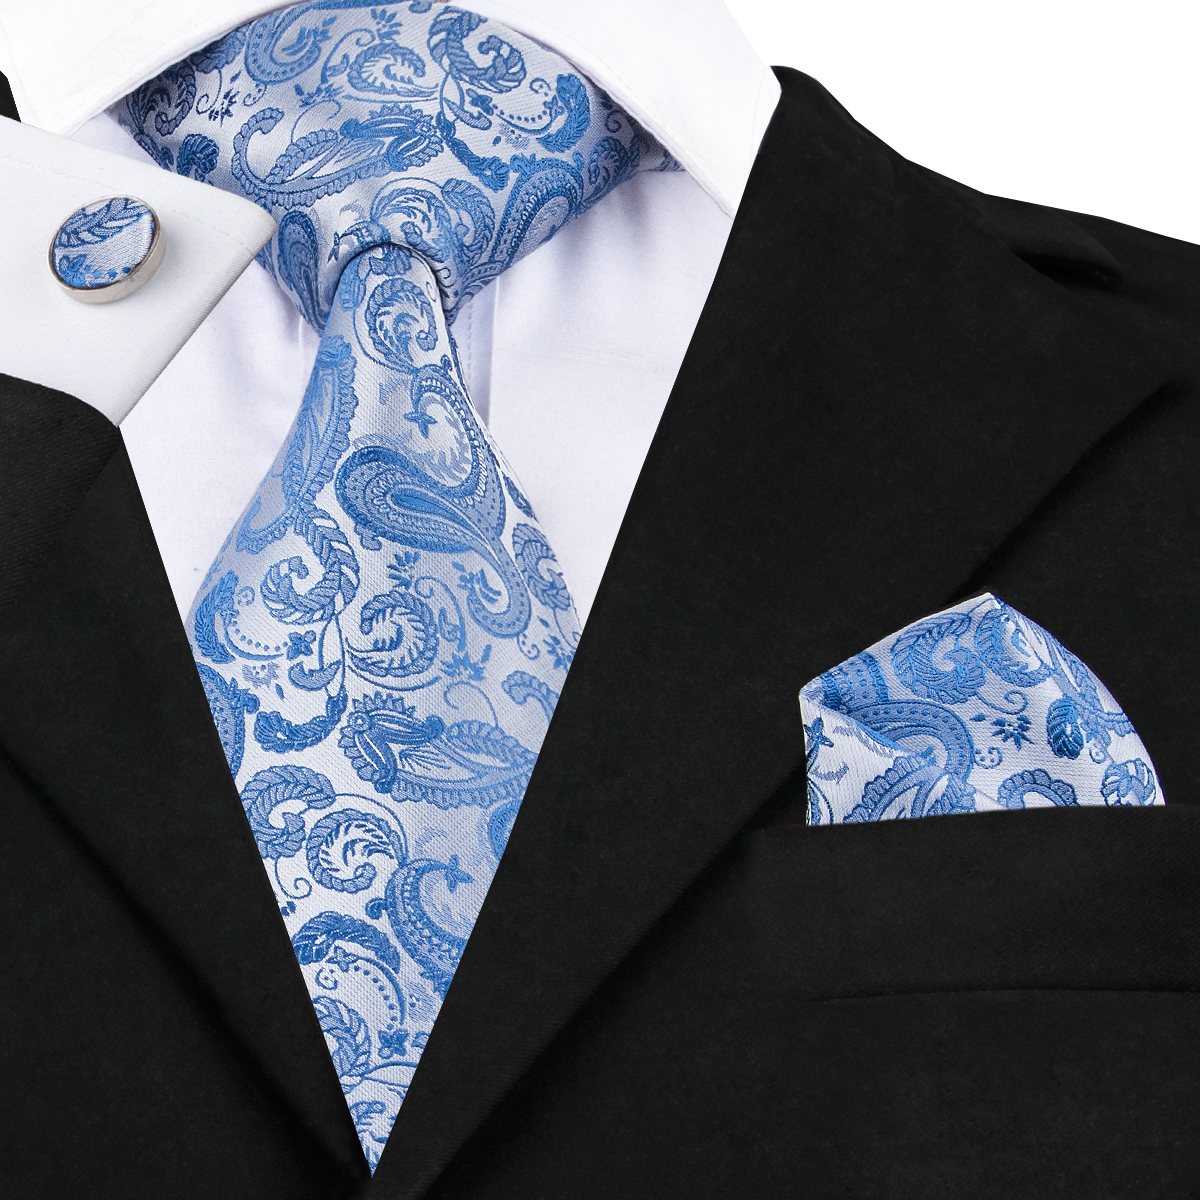 C-1618 Hi-Tie Light Blue Floral Necktie Hanky Cufflinks Set 100% Hand-Made Silk Jacquard Woven Ties for Mens Gift